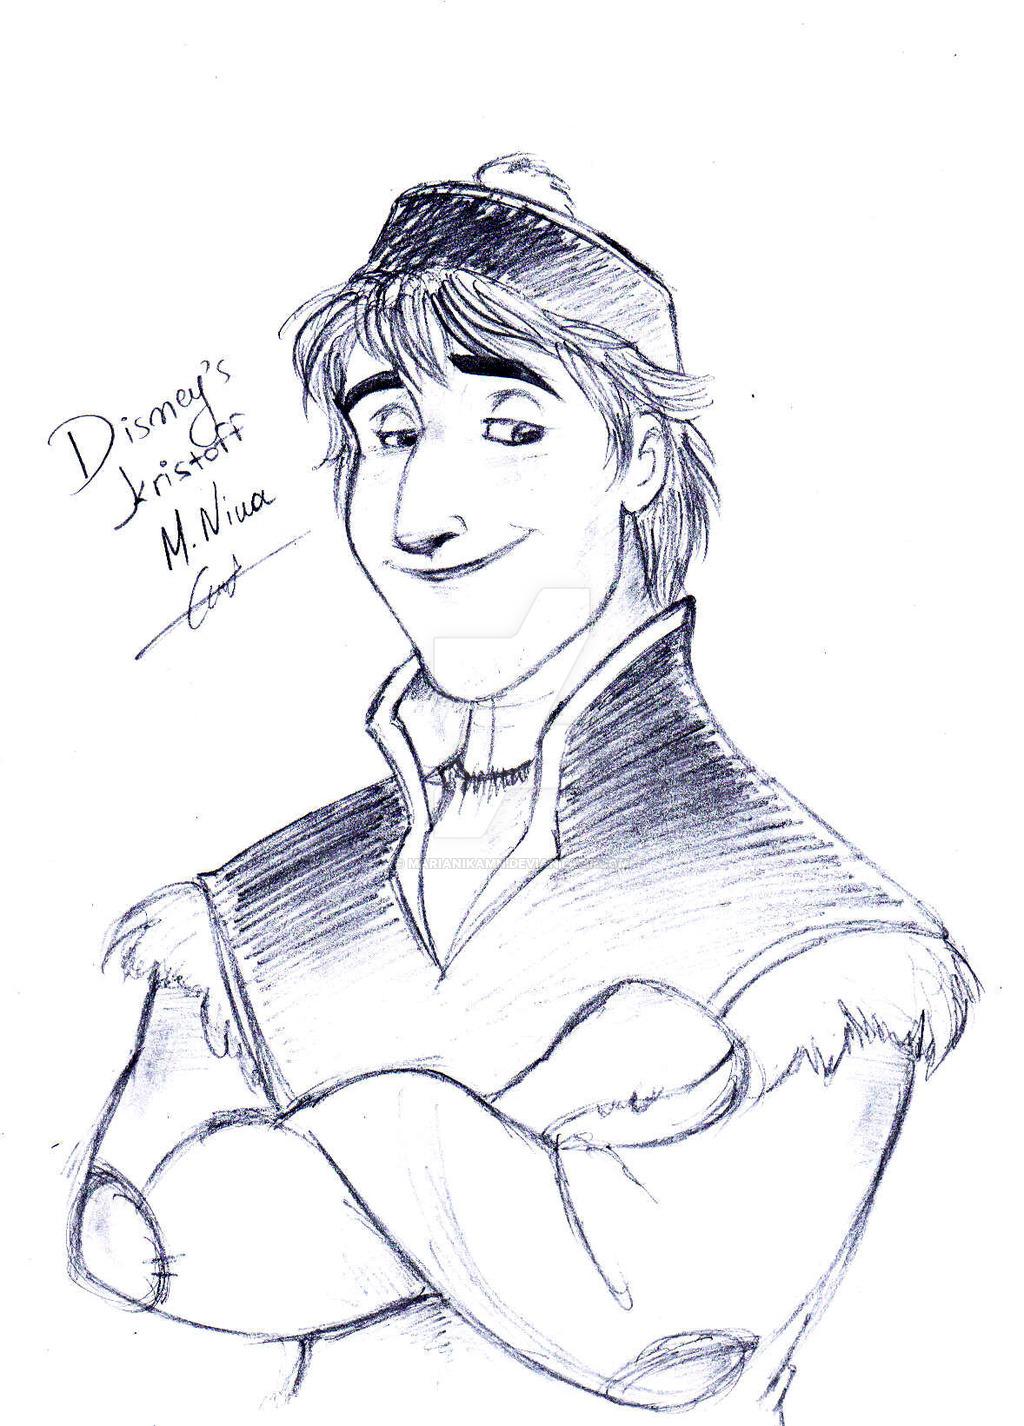 1024x1426 Disney's Frozen Kristoff Sketch By Marianikamn